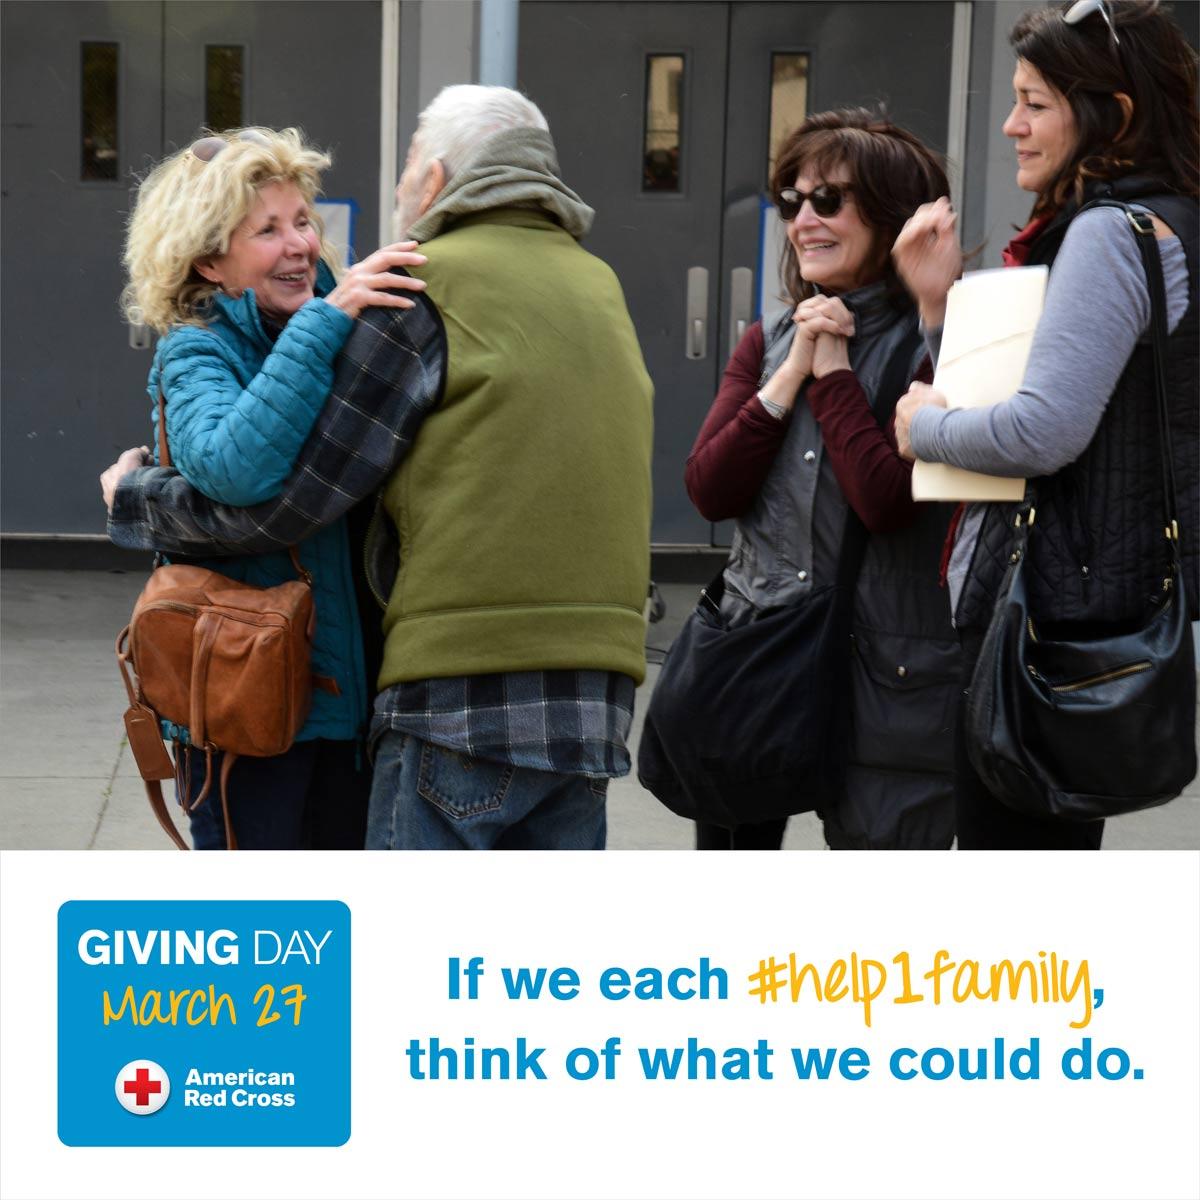 207701-05-Giving-Day-2019-Social-Media-1200x1200-FB3